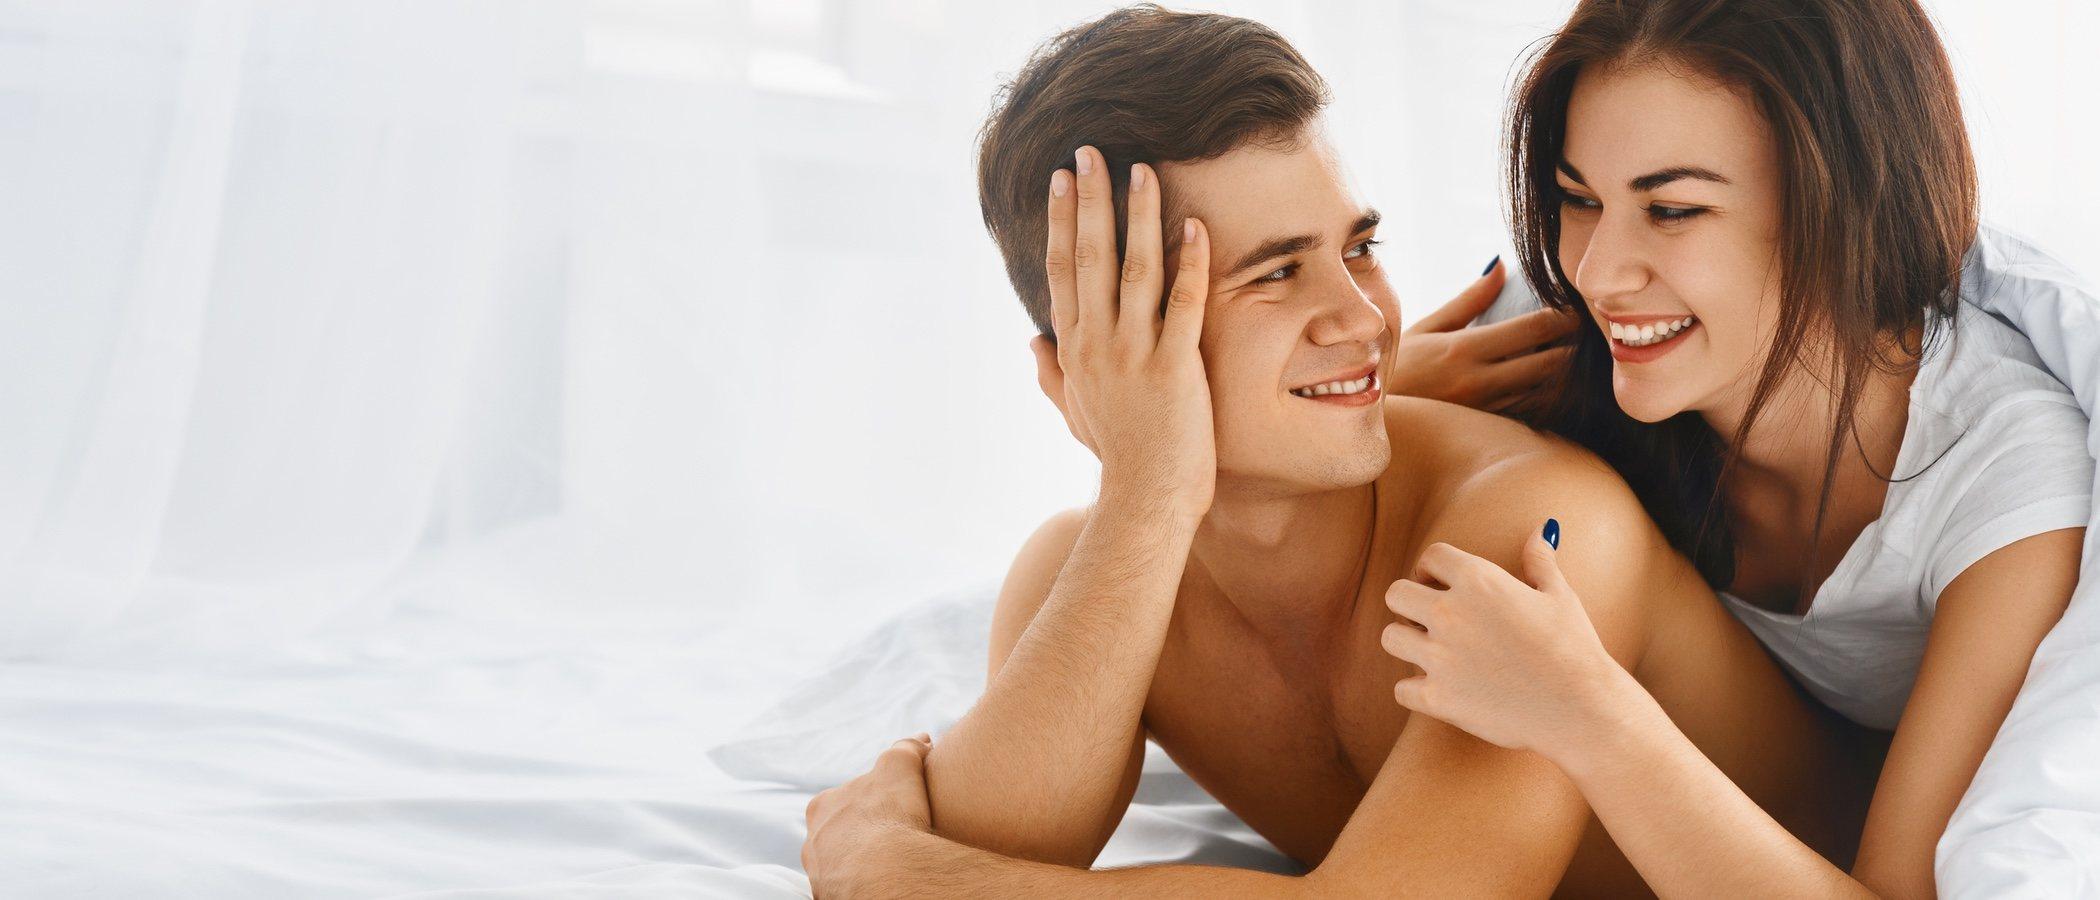 Horóscopo sexual mayo 2018: Acuario